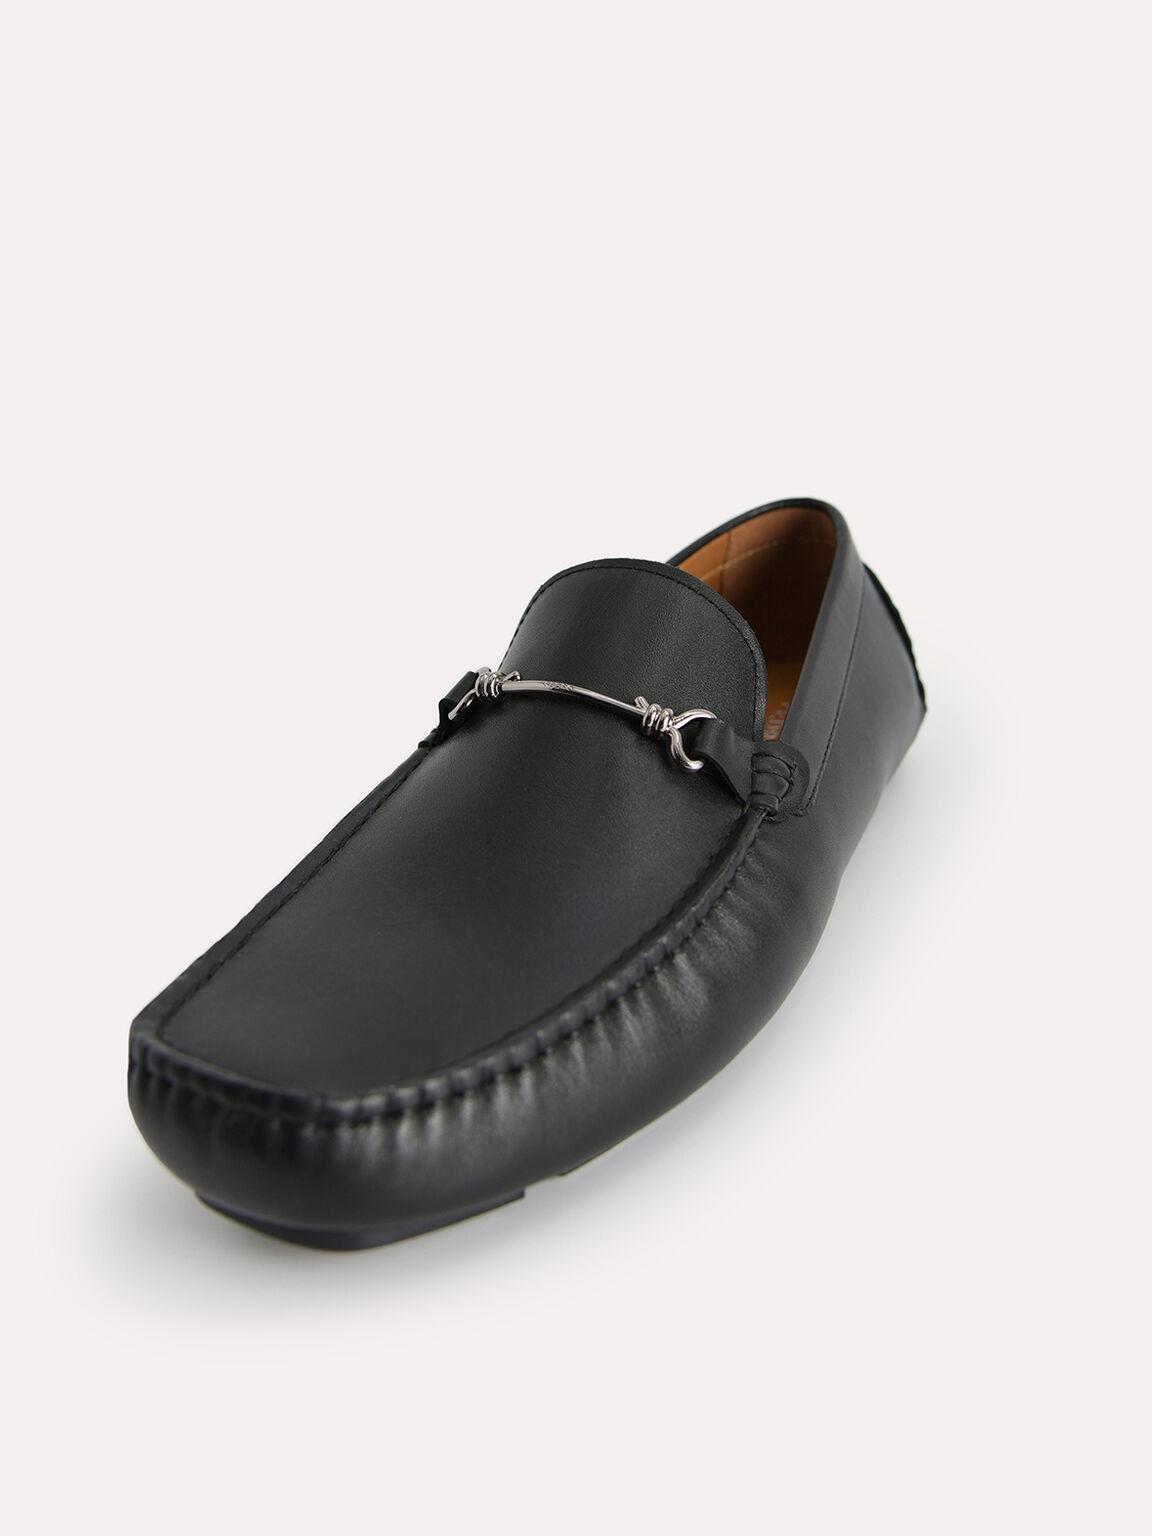 Leather Moccasins with Bit Detailing, Black, hi-res